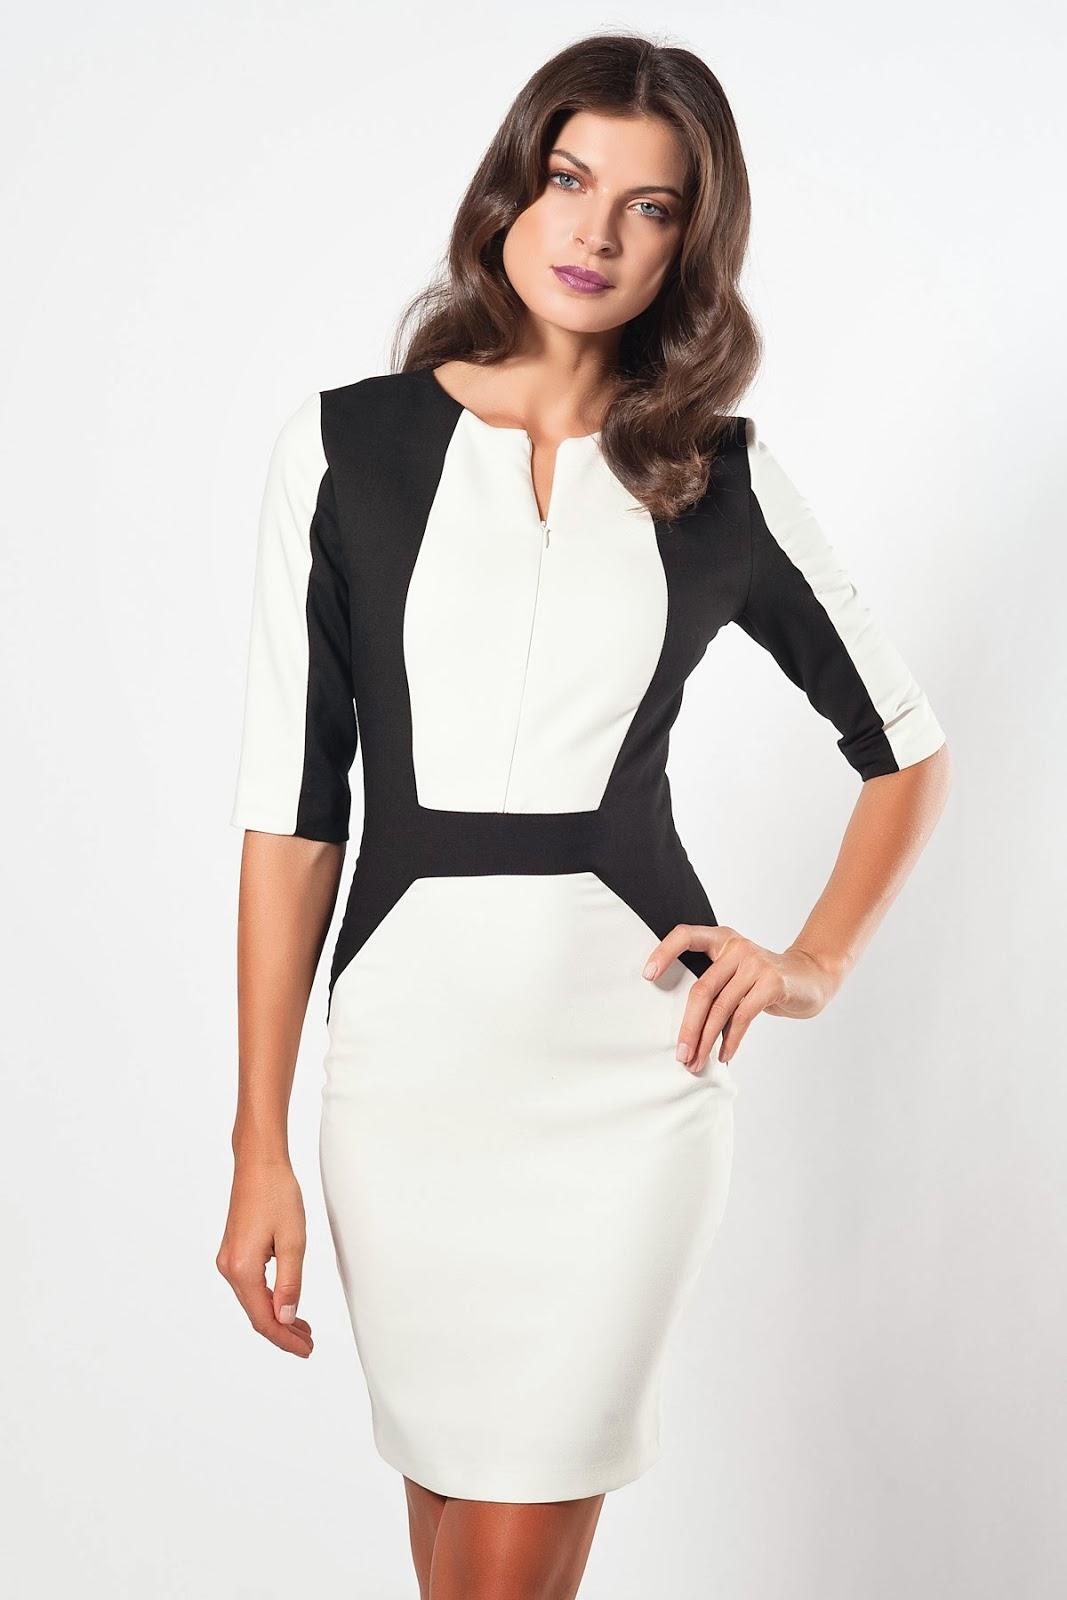 2015fashion: black evening dresses , ladies elegant day